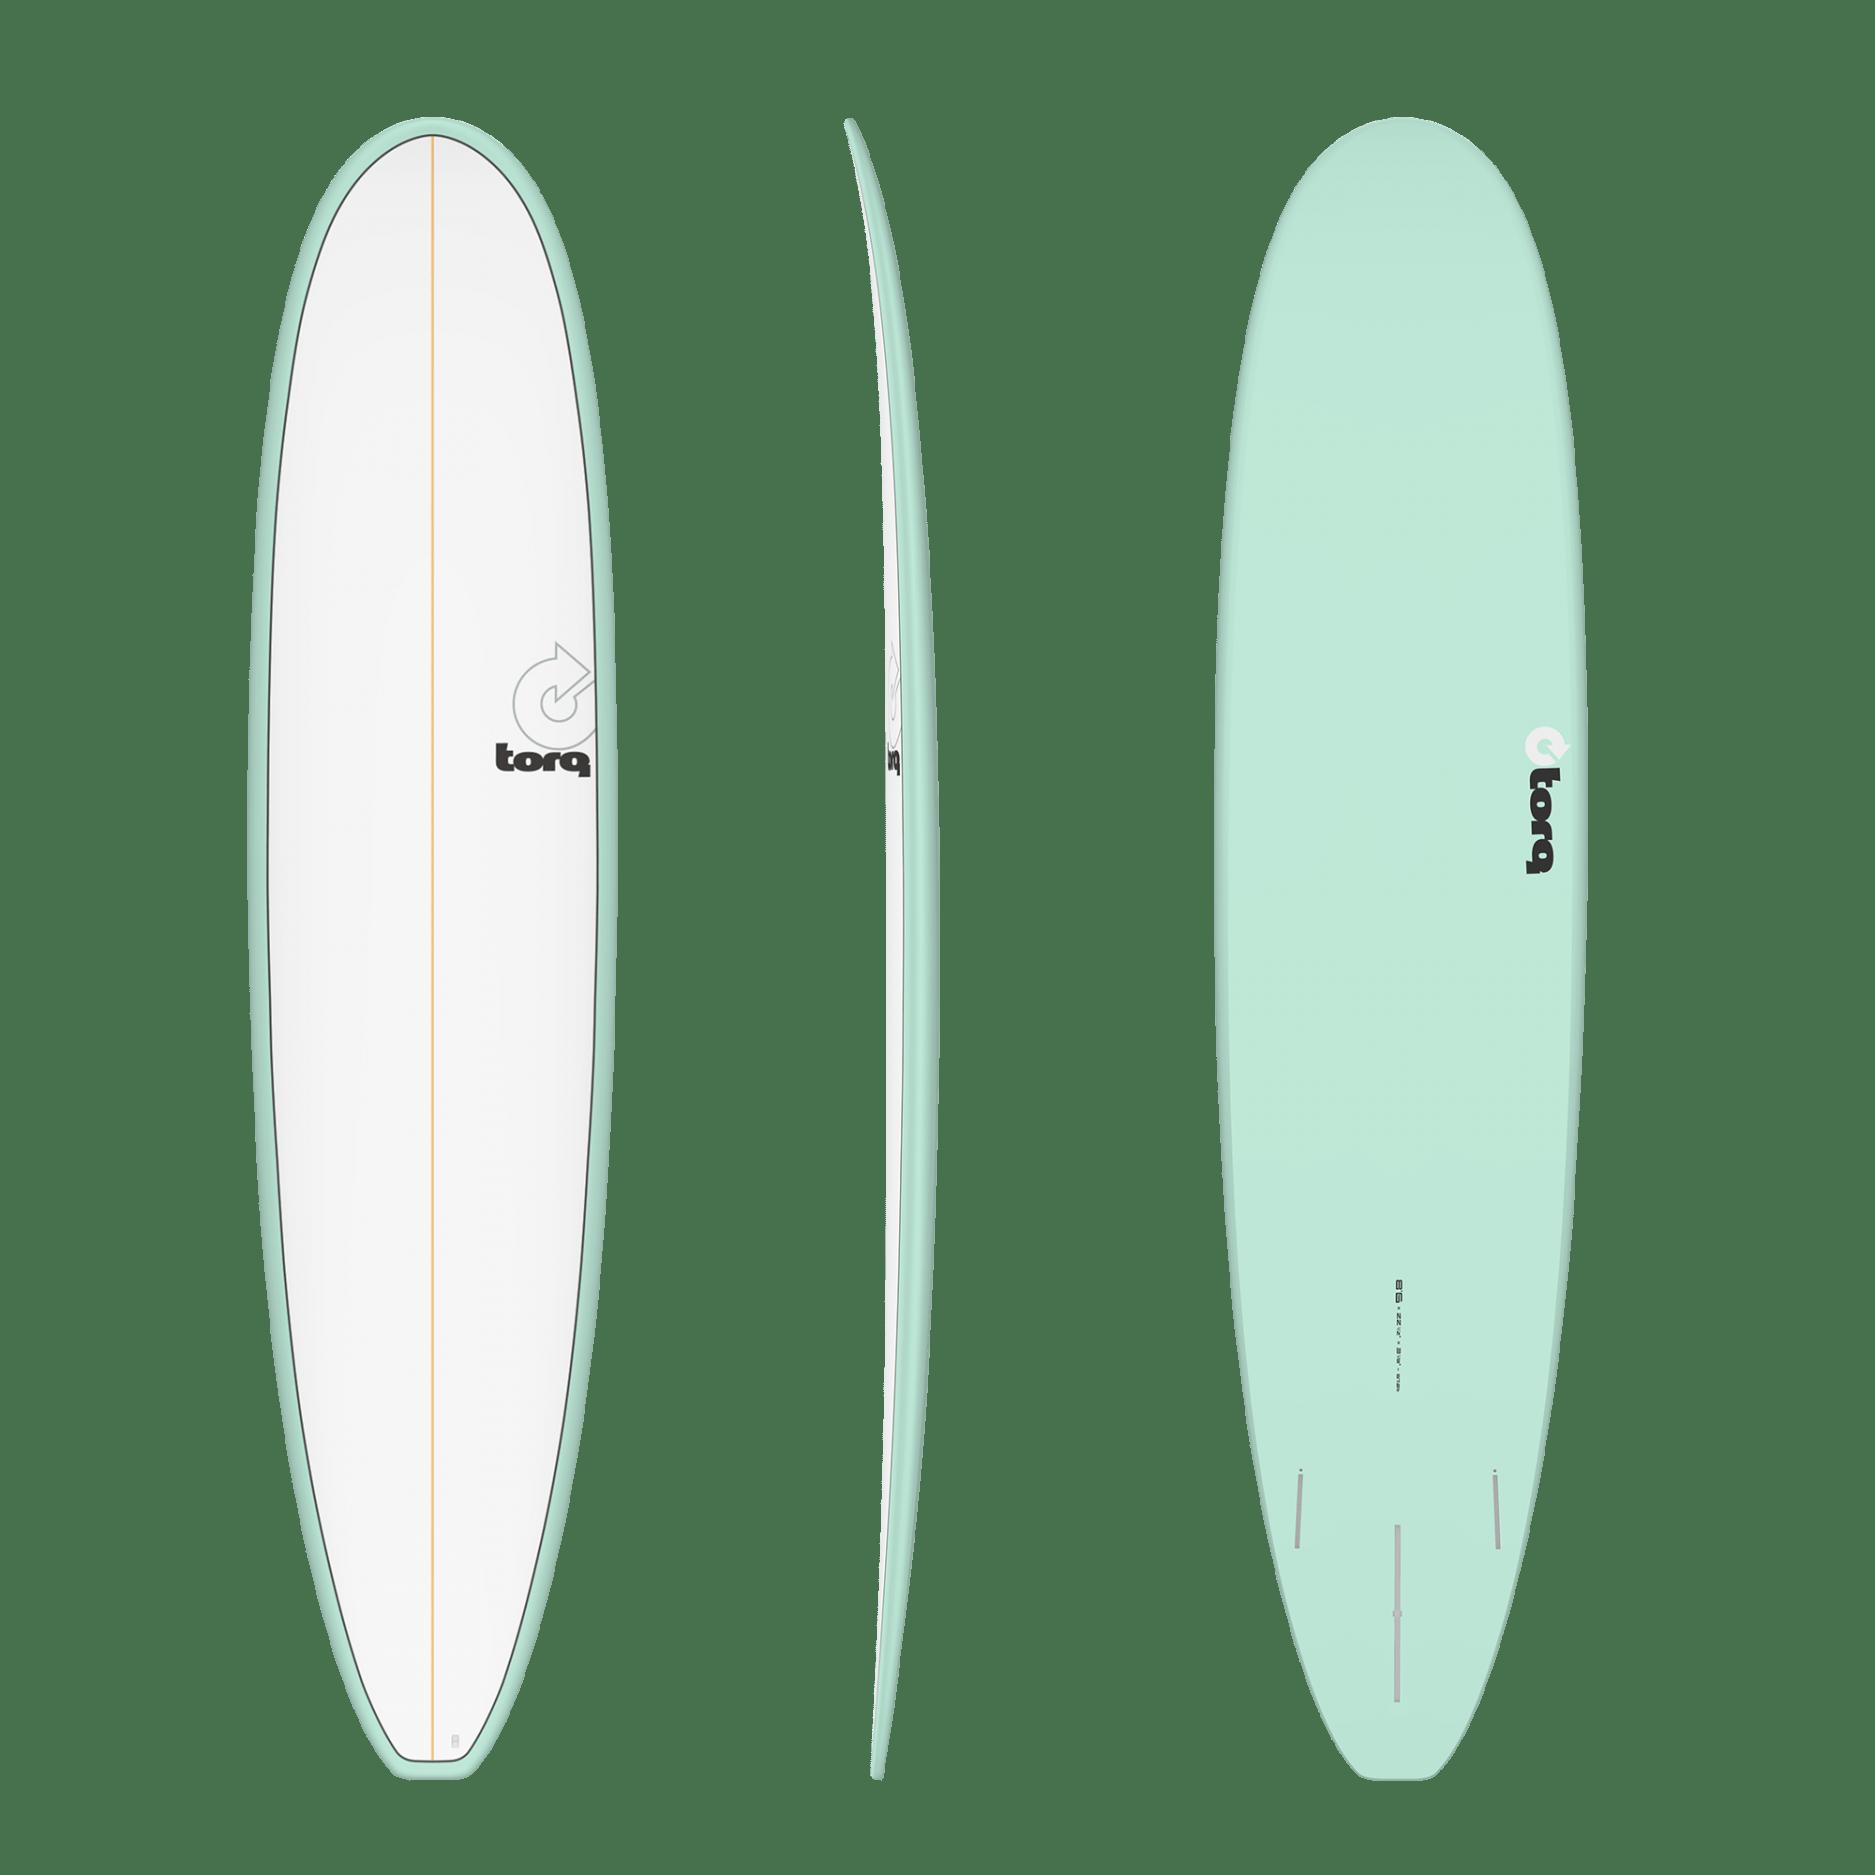 Torq Longboard Seagreen White 8'6